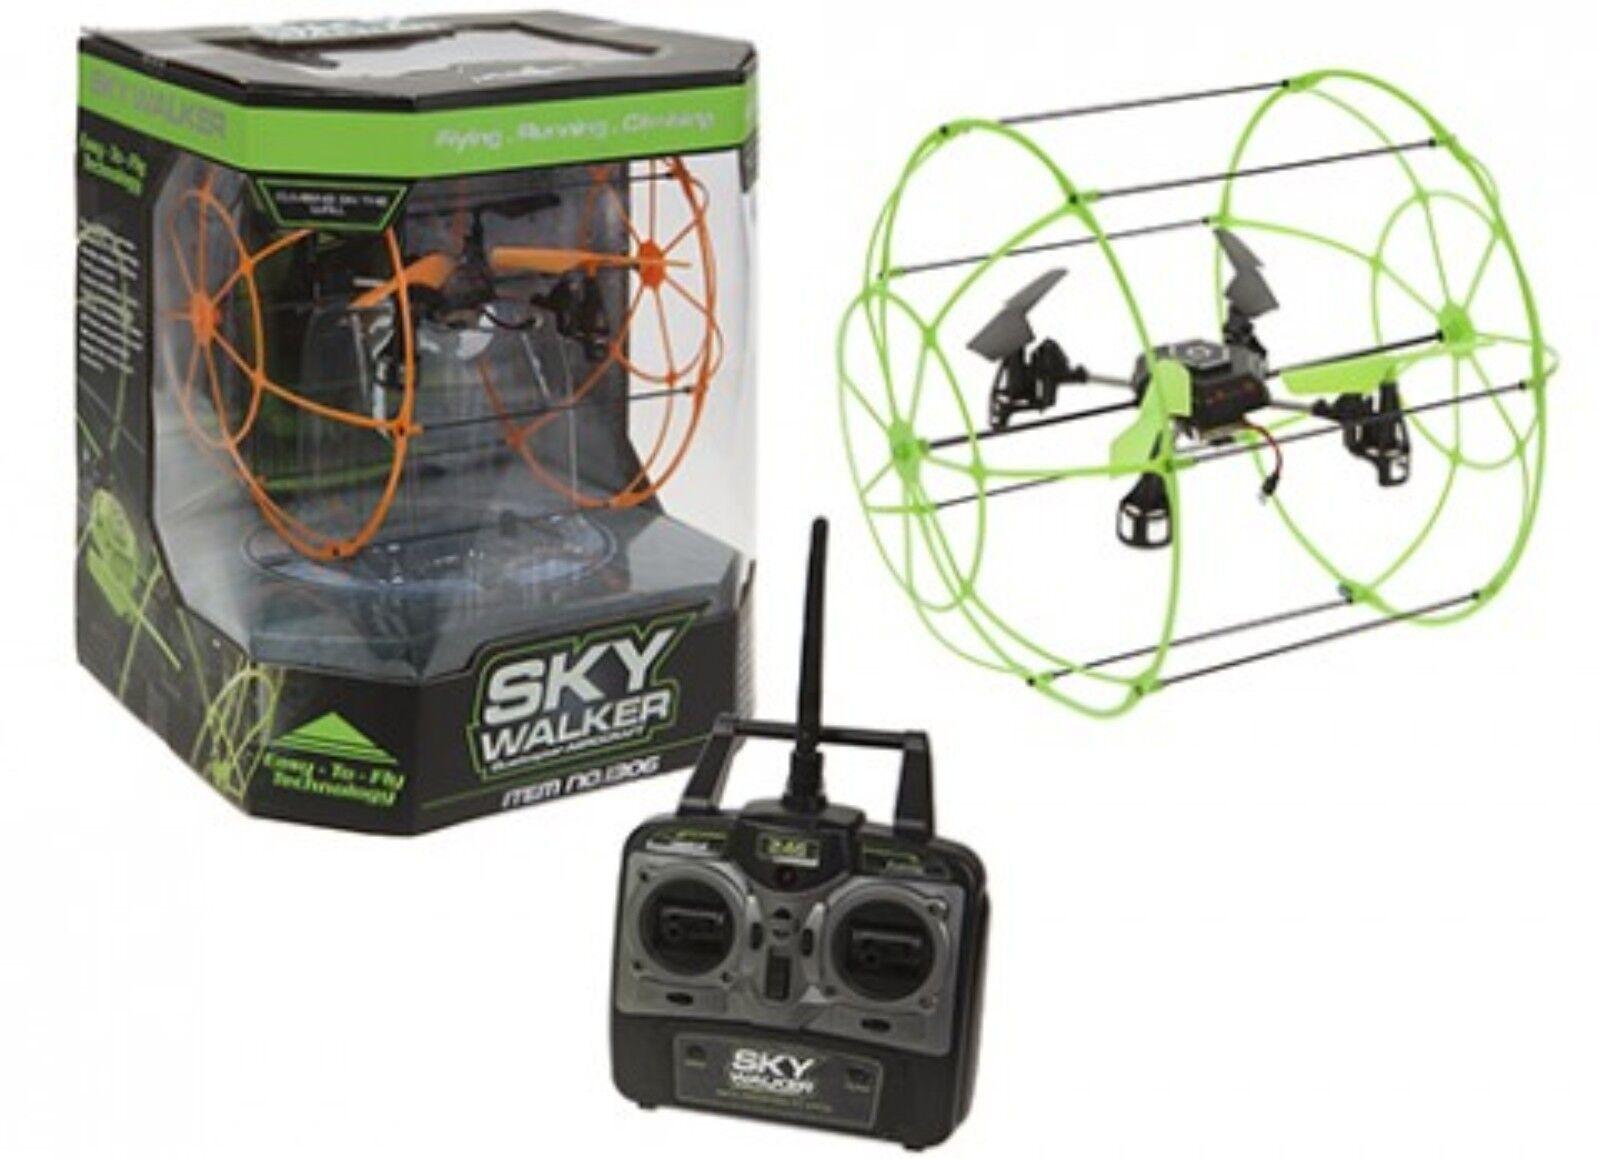 SKY WALKER Cuadricóptero - 2.4GHZ Antena Drone escalada, escalada, escalada, Rolling, Volador Drone 4240 97439f